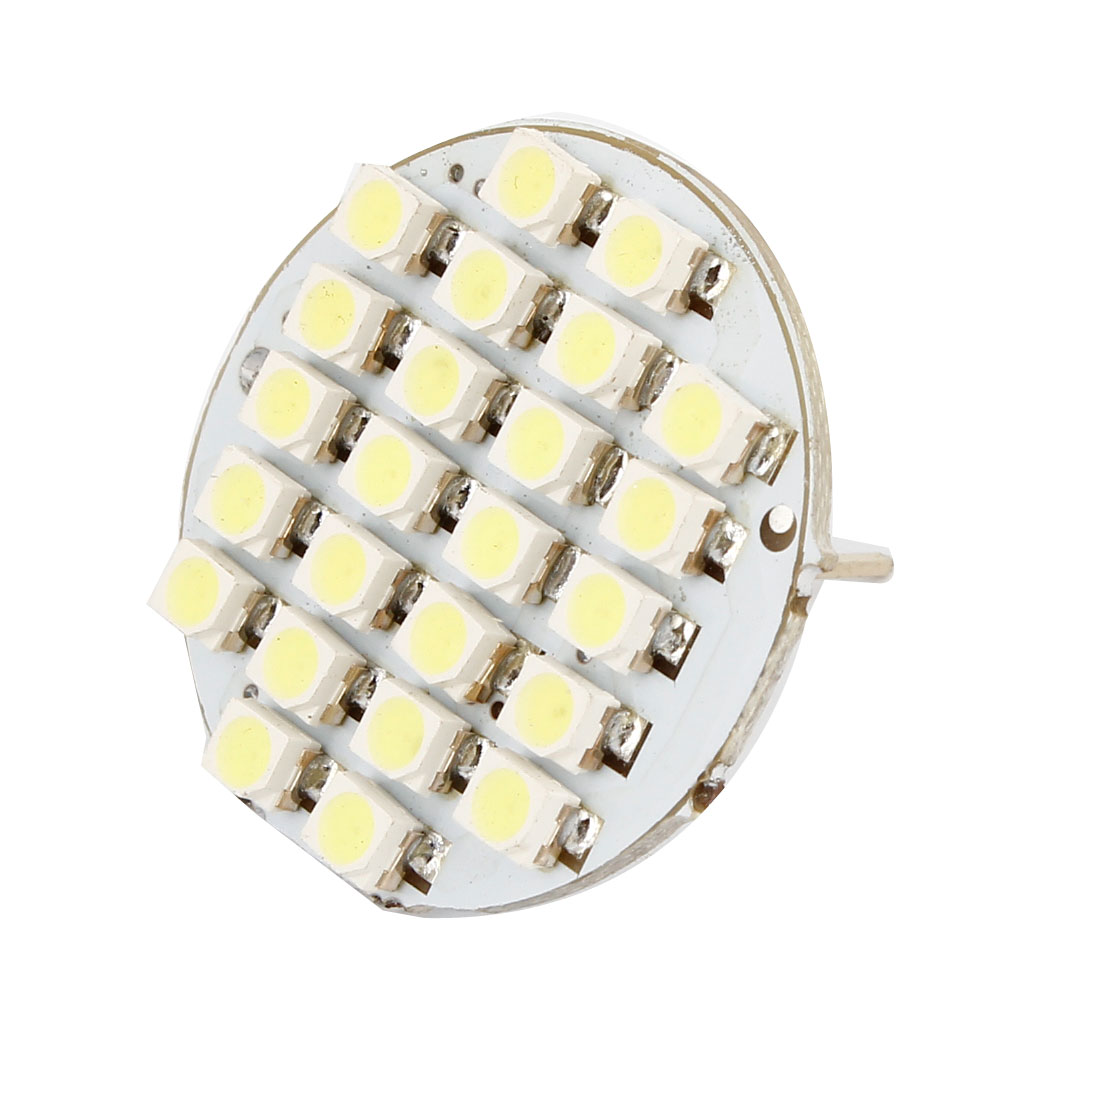 Vertical G4 Back Pin White 1210 3528 SMD 24LED Indicator Dashboard Light Bulb